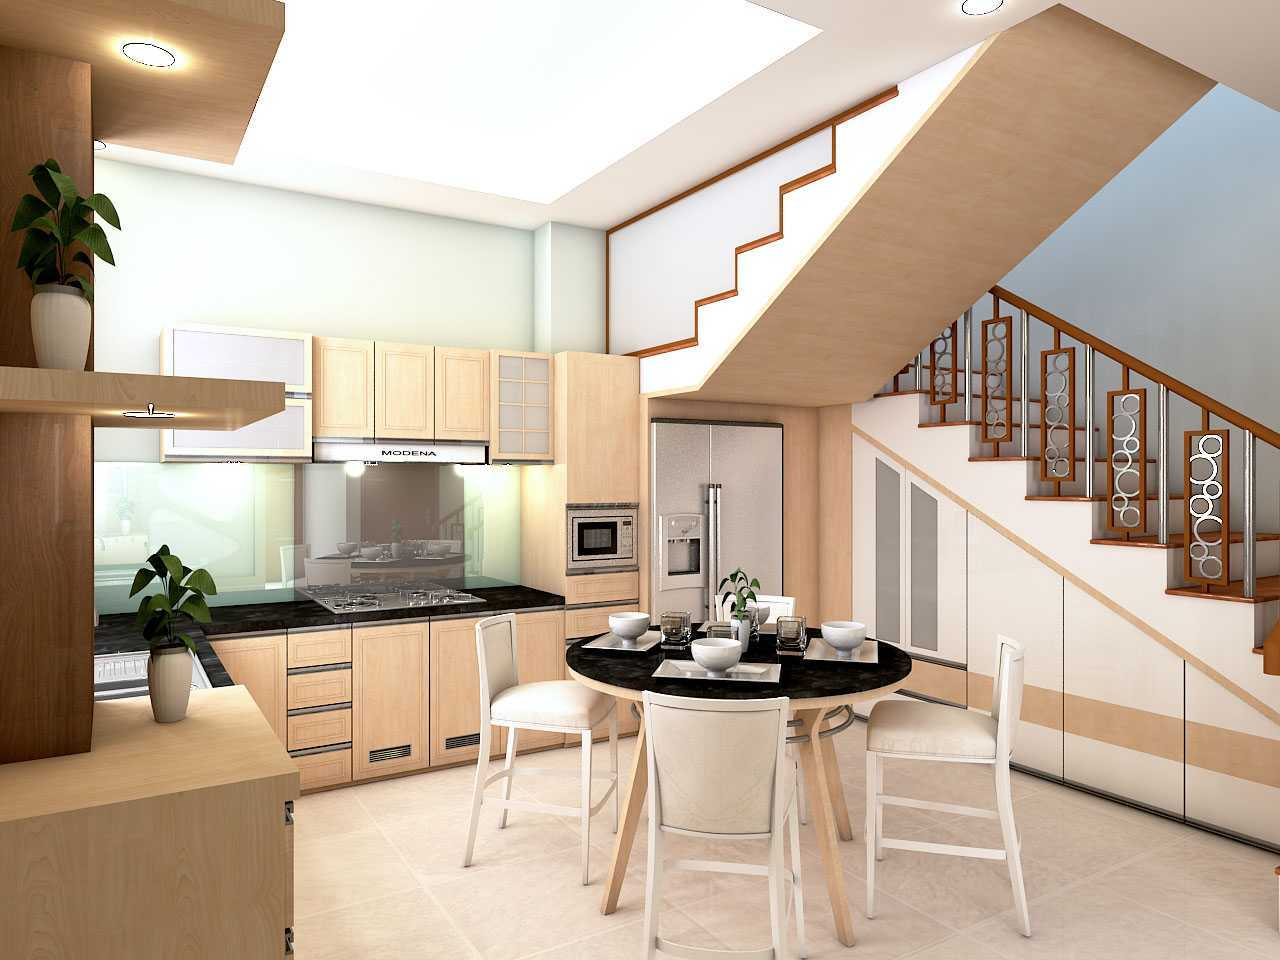 interior design furniture images. interior design furniture images. arteta \\u0026 partisi dan kitchen set modern images